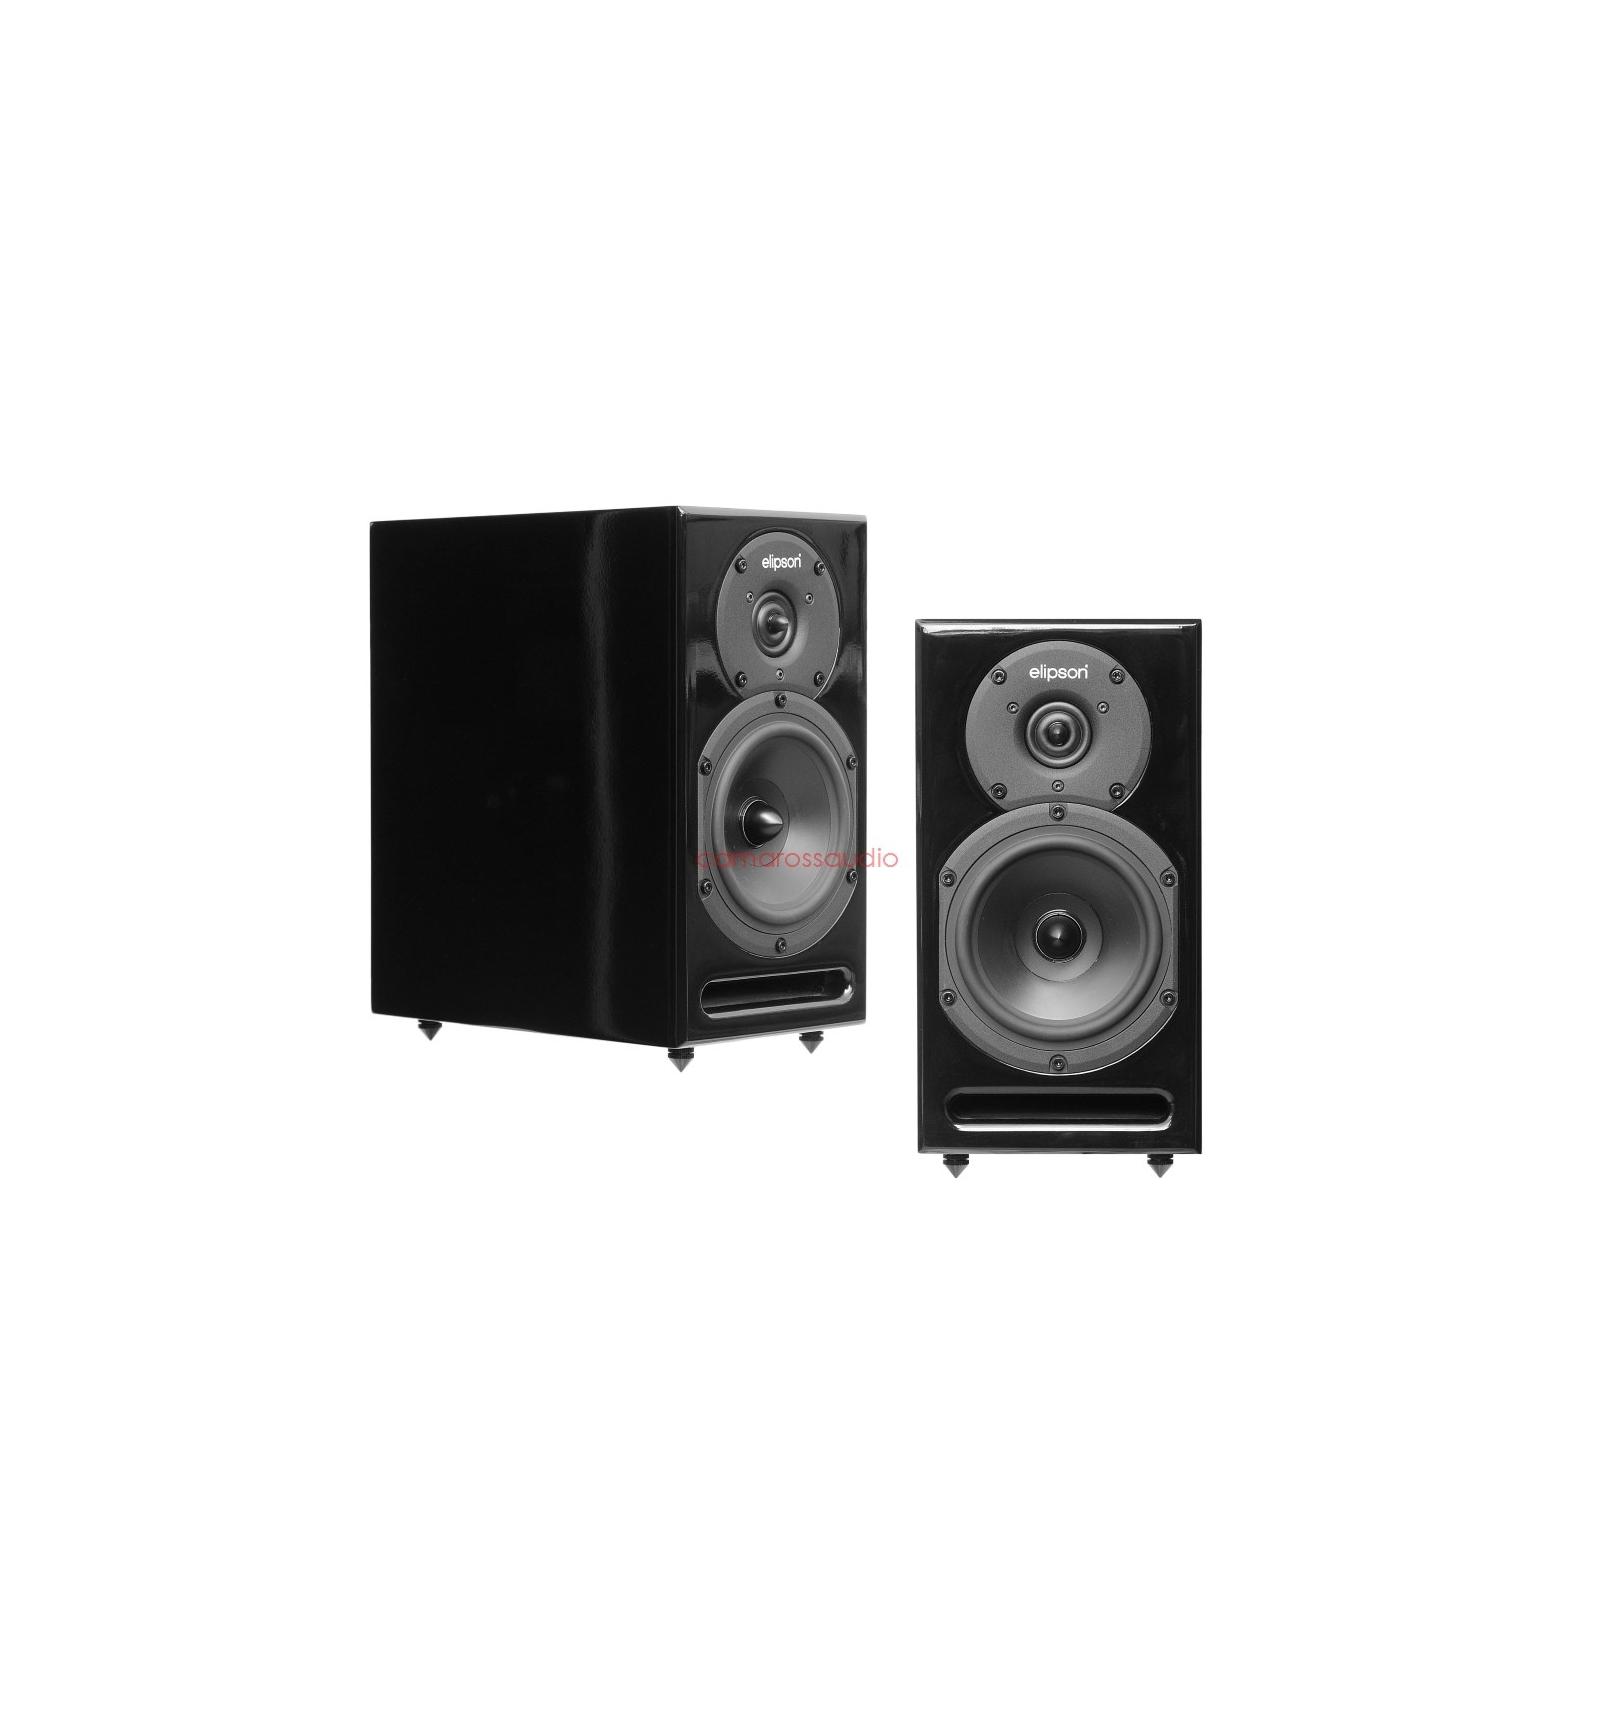 Elipson Studio Pro Camaross Audio Hifi High Detail